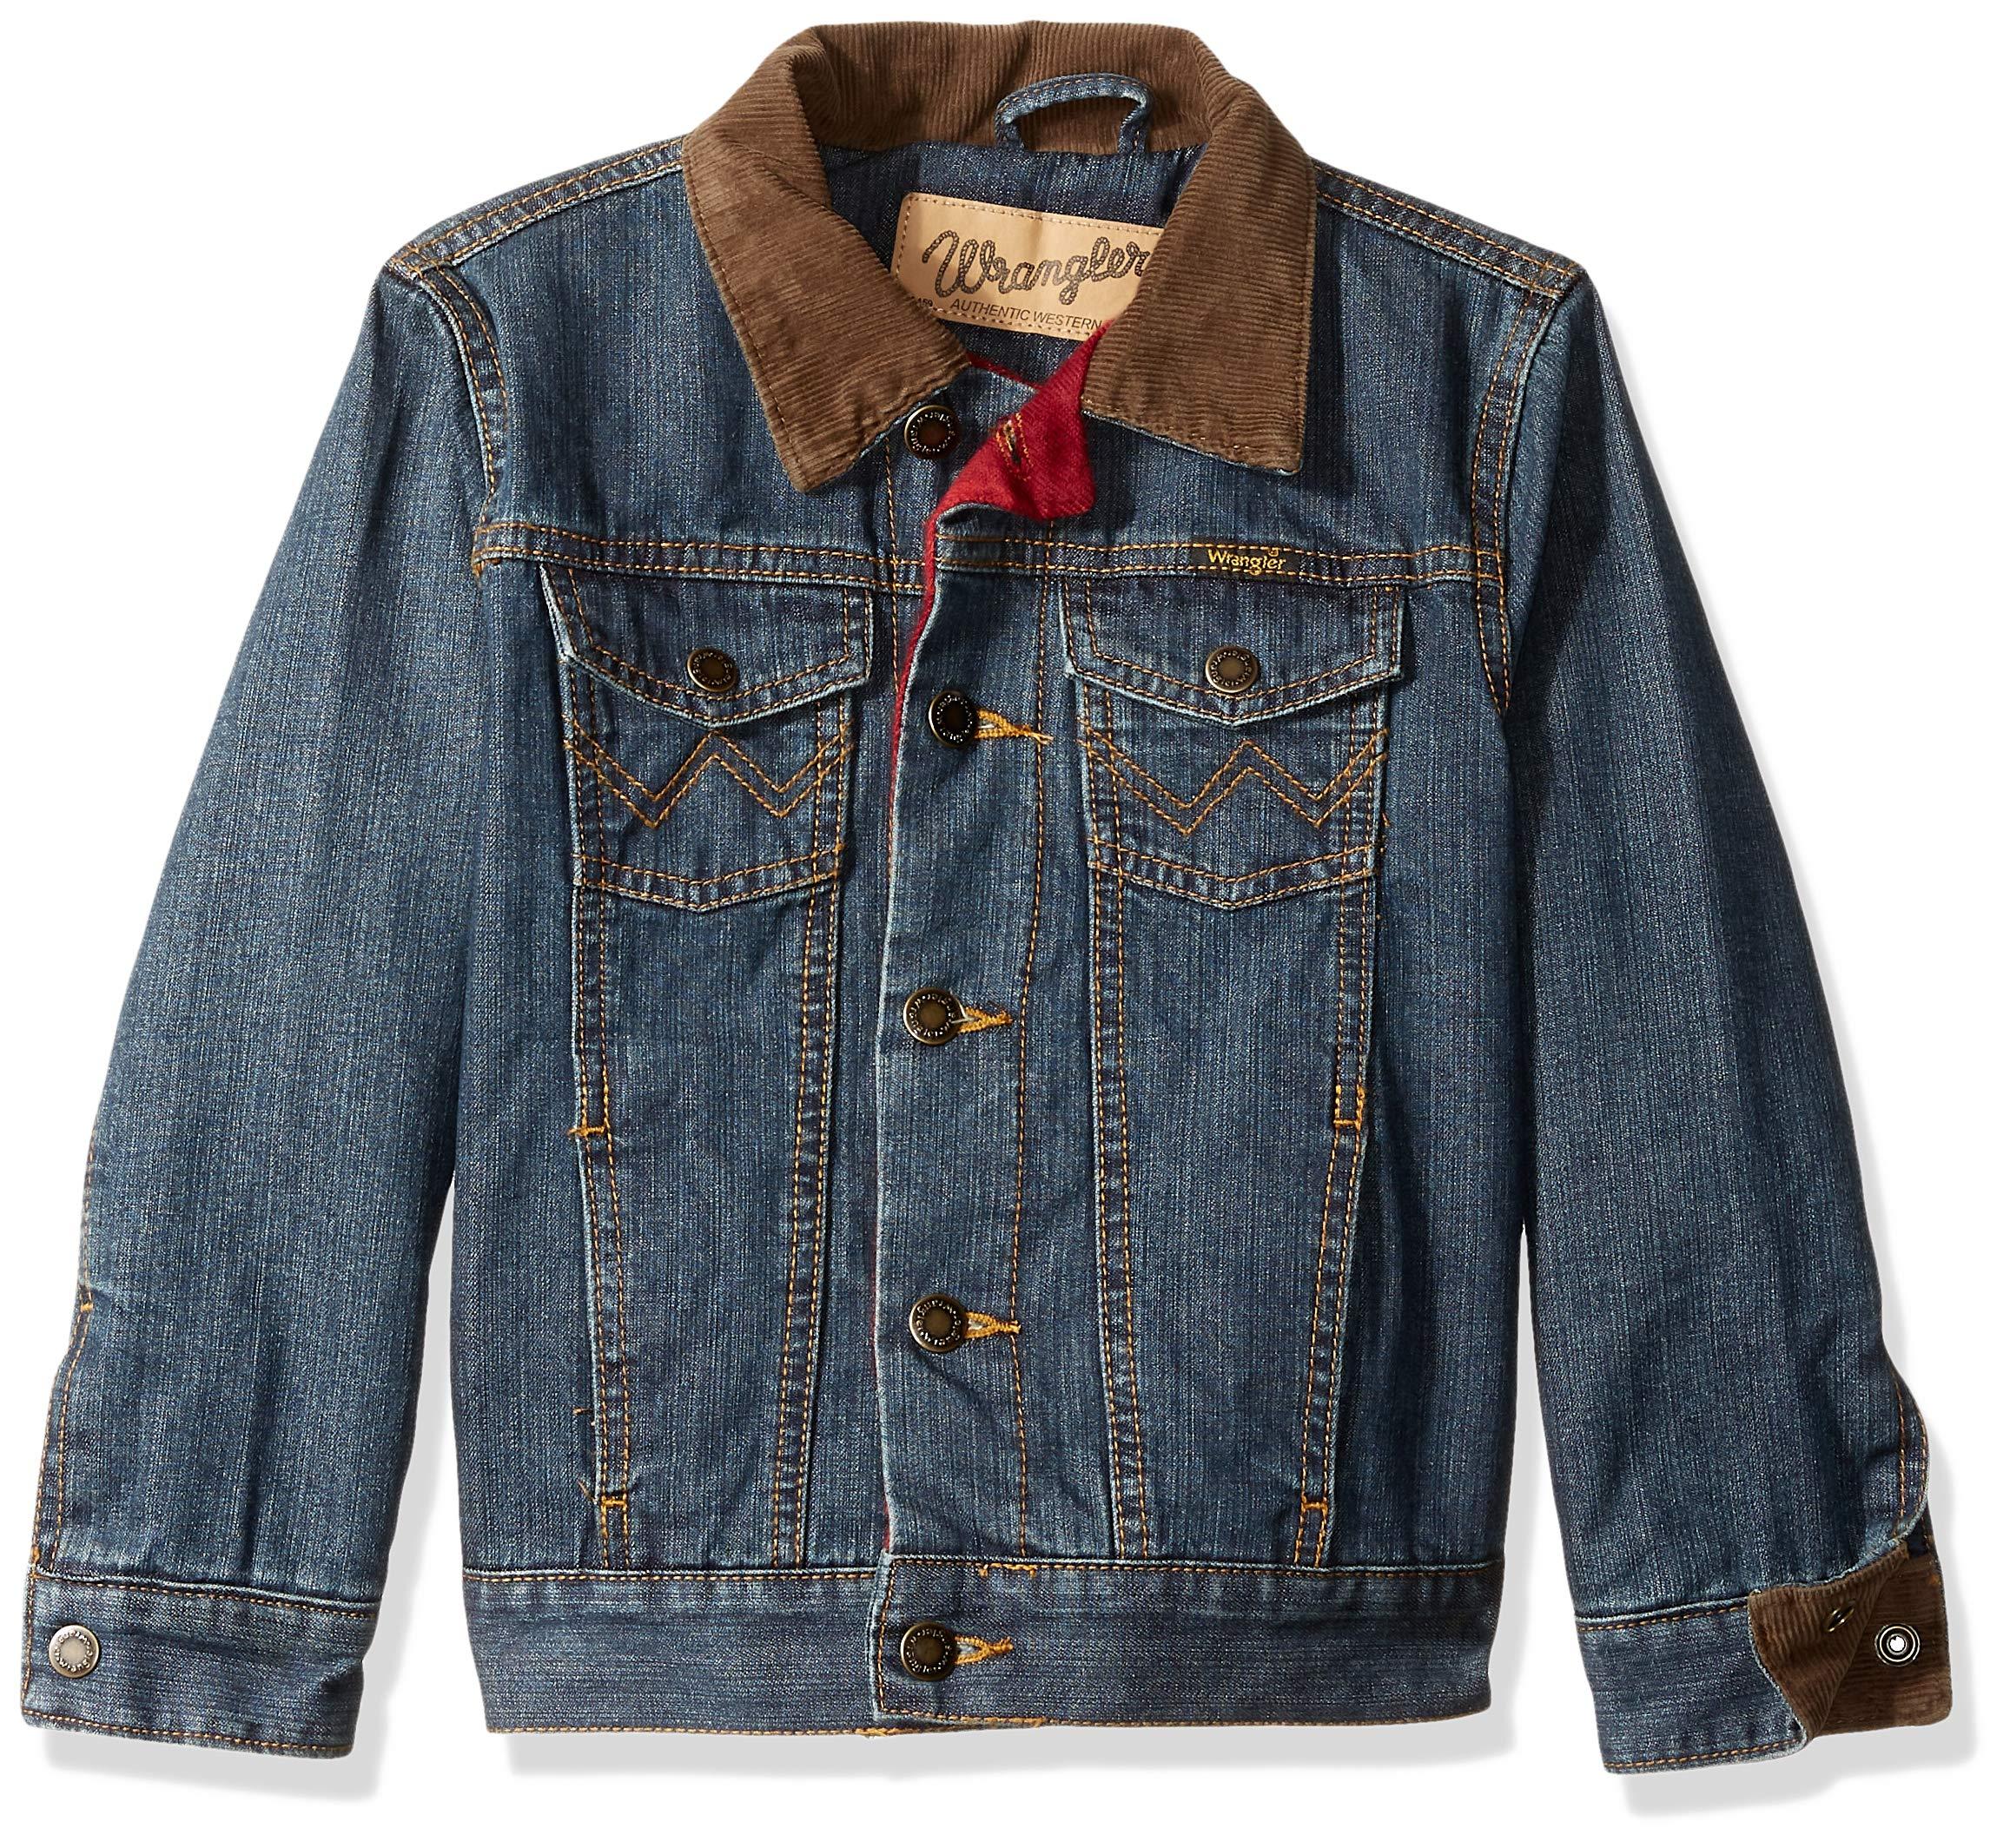 Wrangler Boys' Lined Denim Jacket, rustic blue XS